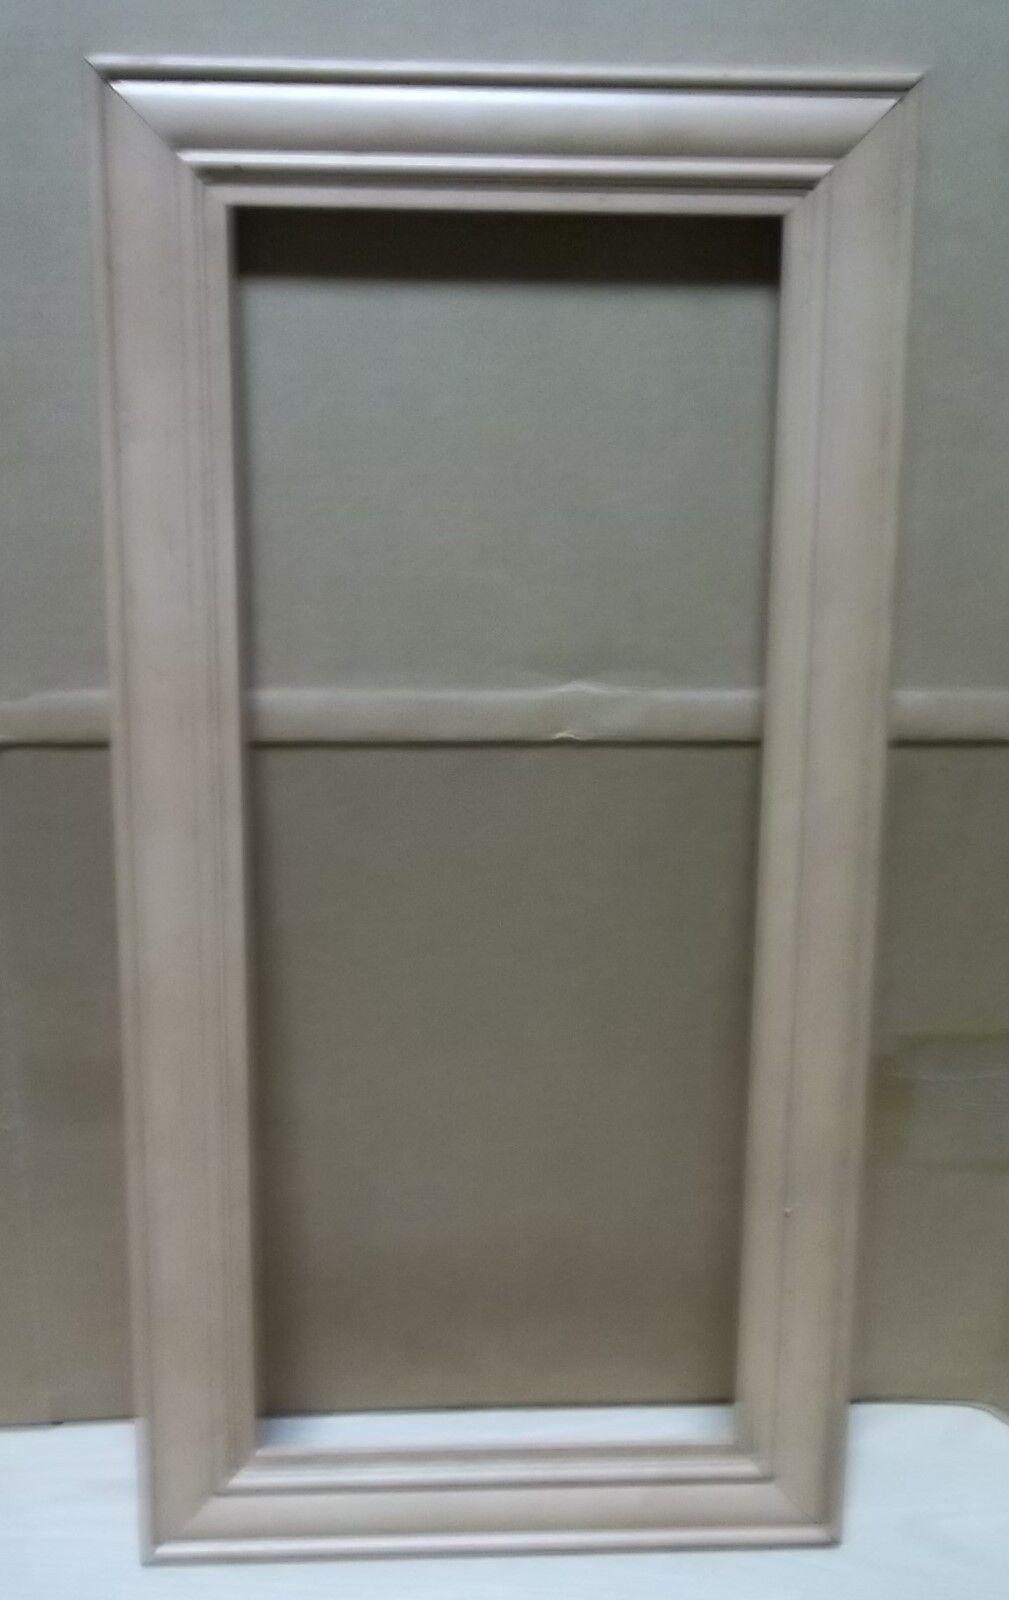 2 FRAME CABINET DOORS PAINT GRADE MAPLE OPEN FRAME 14 3 4 X 28 3 4